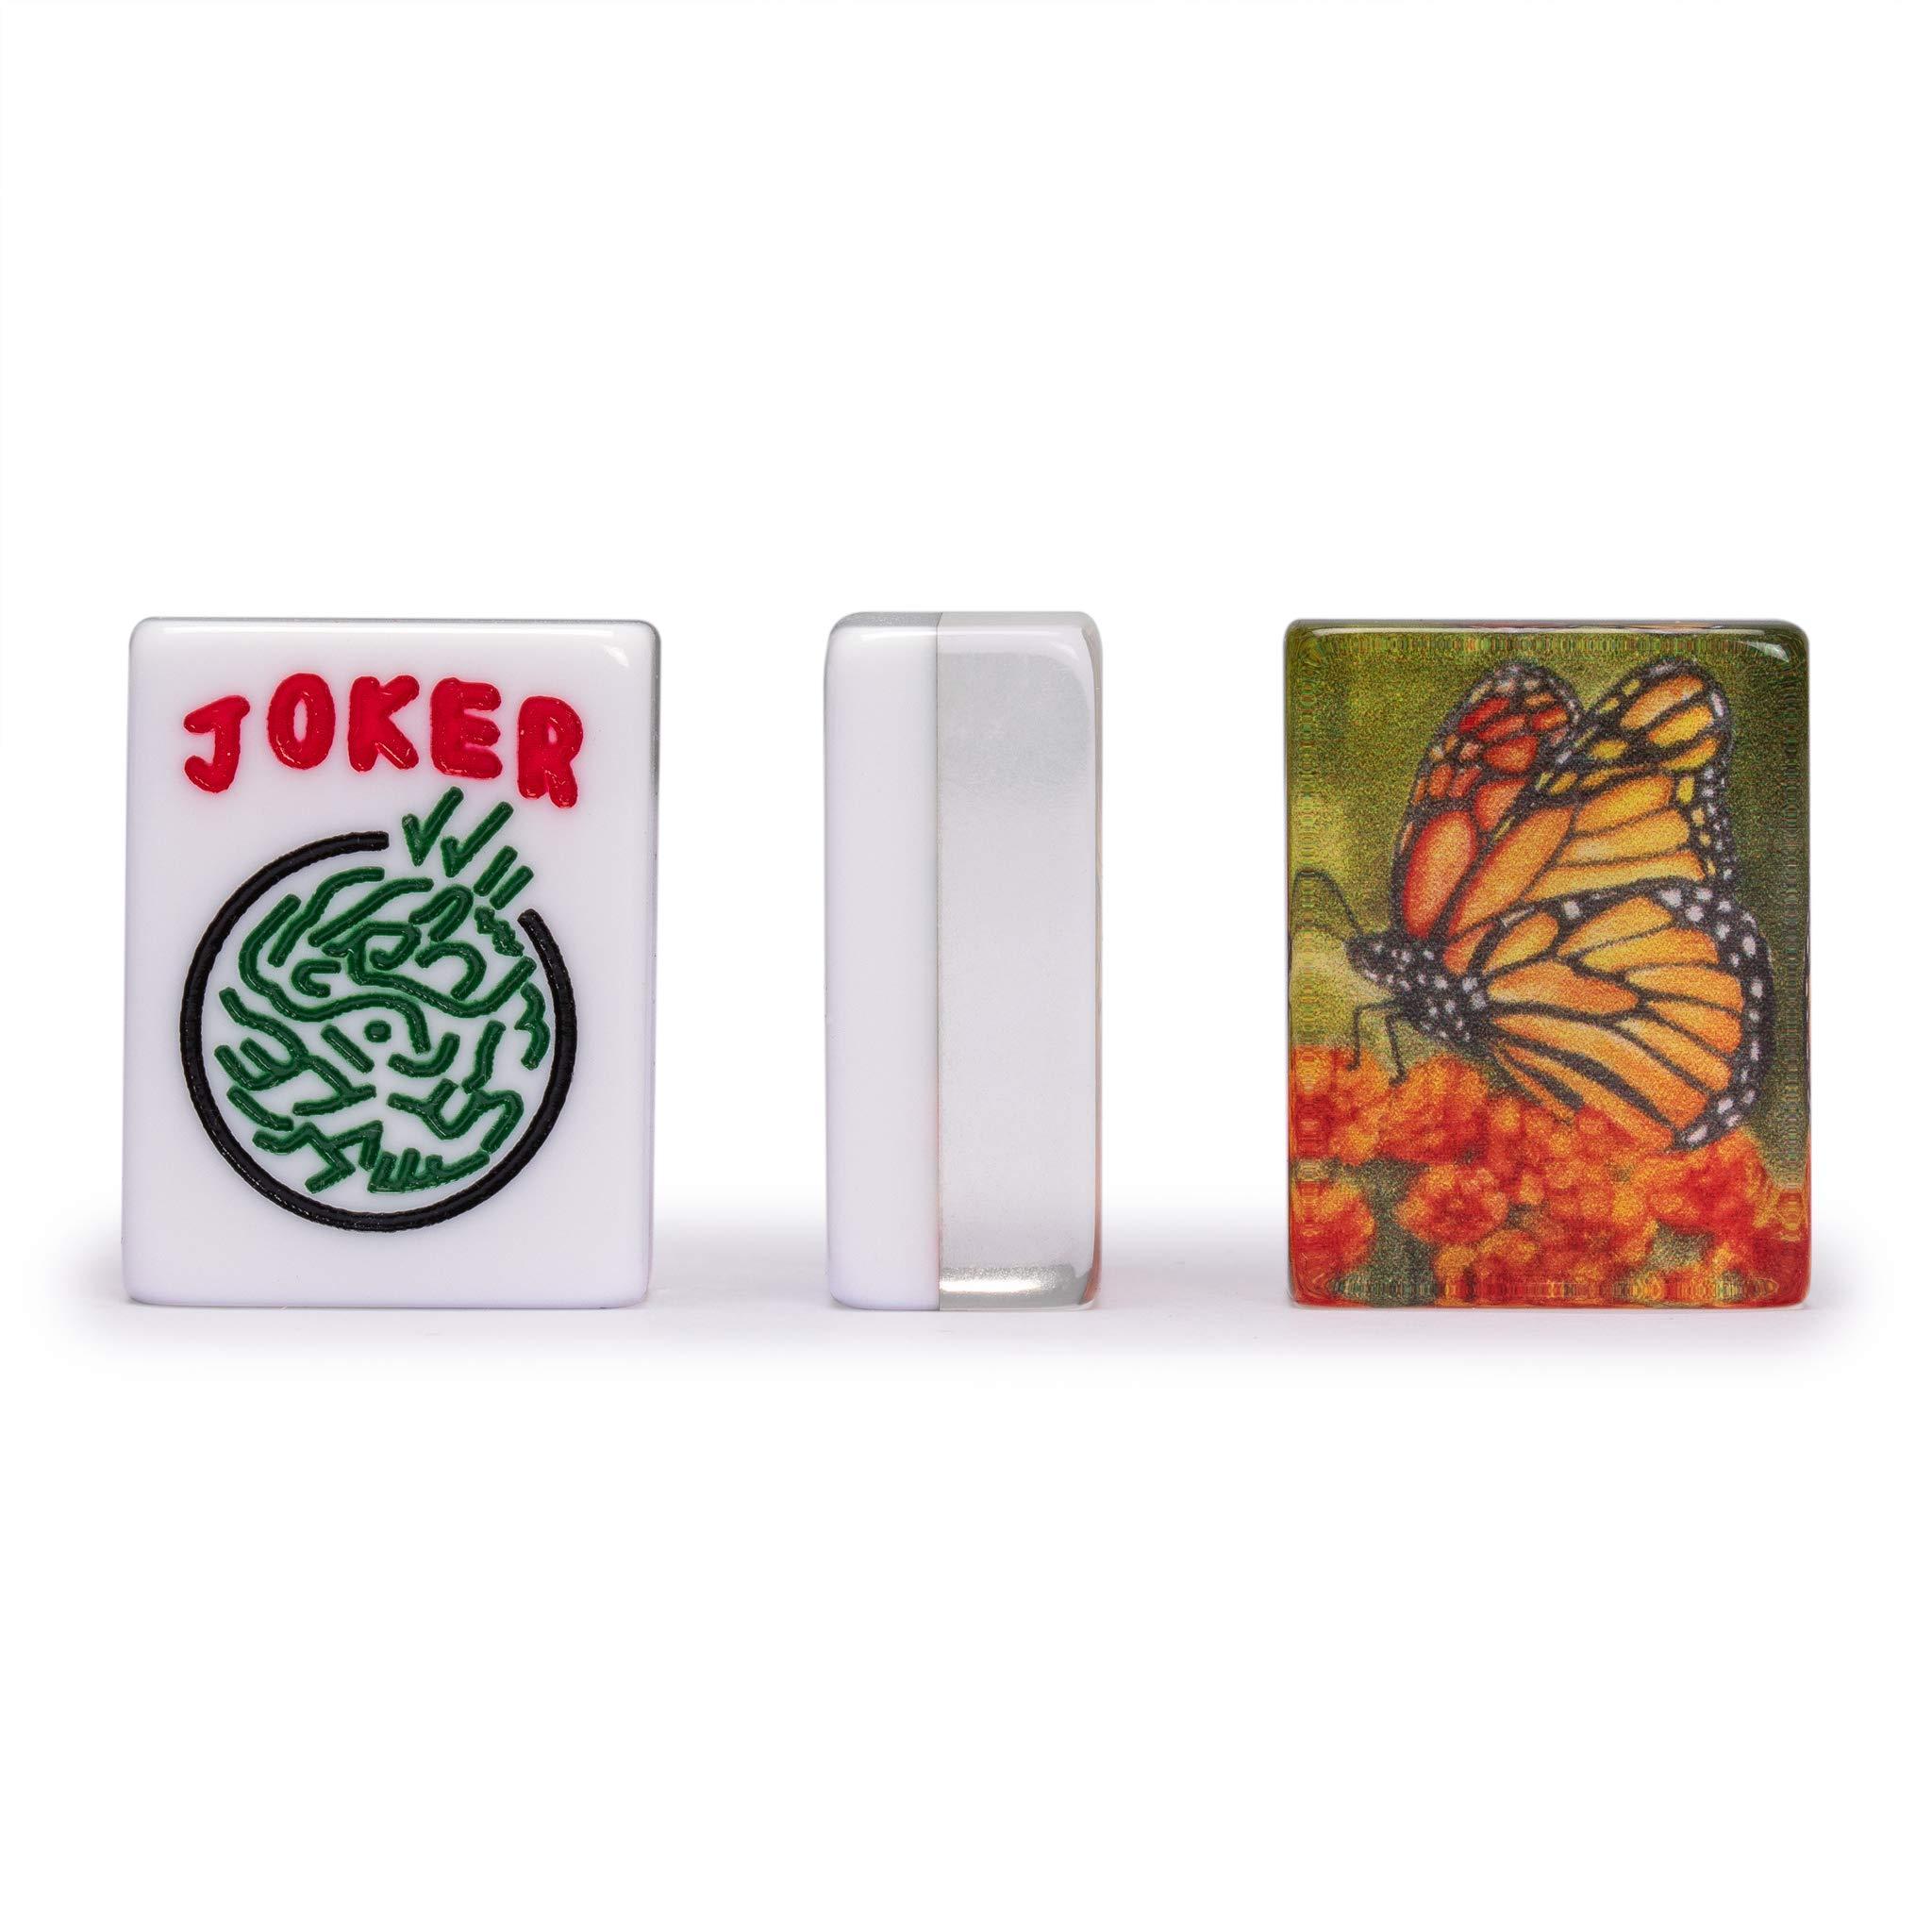 Yellow Mountain Imports American Mahjong Tiles, Papillon - 1.2 x 0.9 x 0.5 inches (30 cm x 23 cm x 13 cm) - 166 Acrylic Standard Size Mahjong Tiles